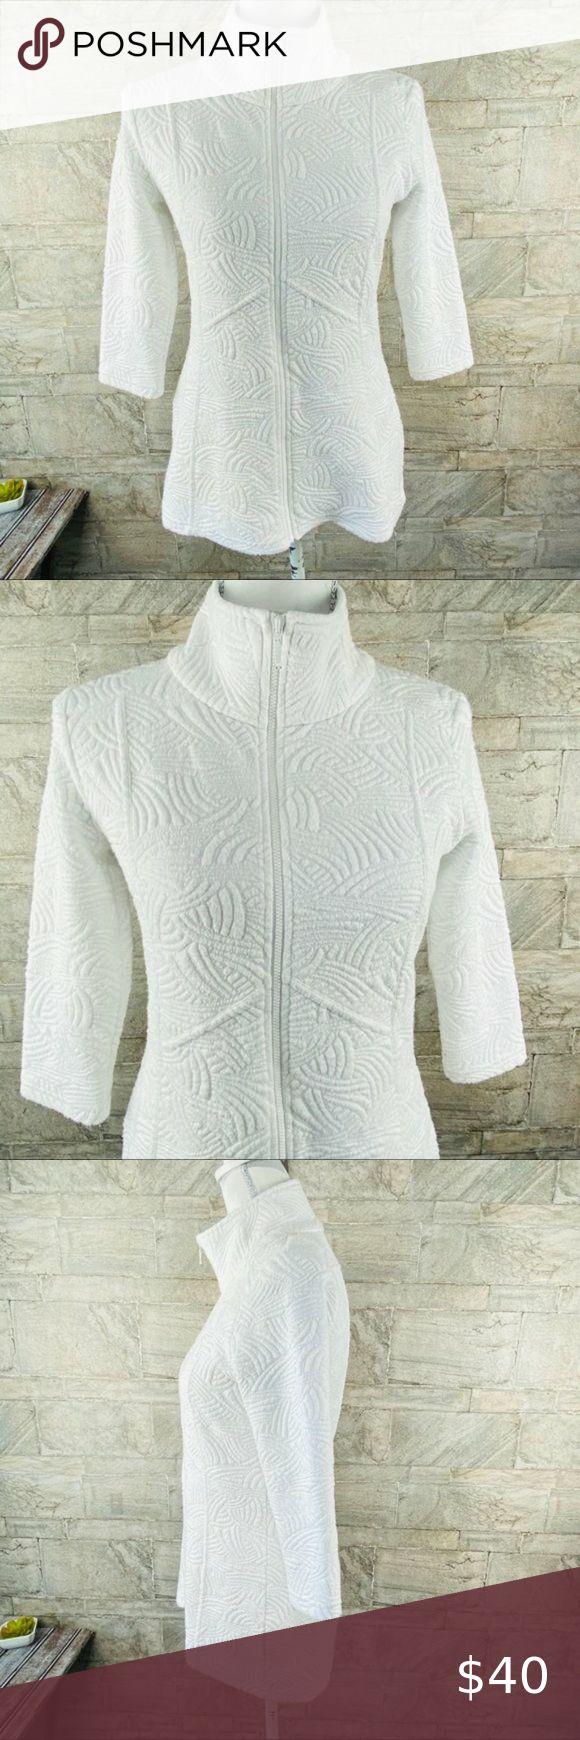 Sno Skins Sport Fabric Braided Jacquard Turtleneck Clothes Design Turtle Neck Jackets For Women [ 1740 x 580 Pixel ]